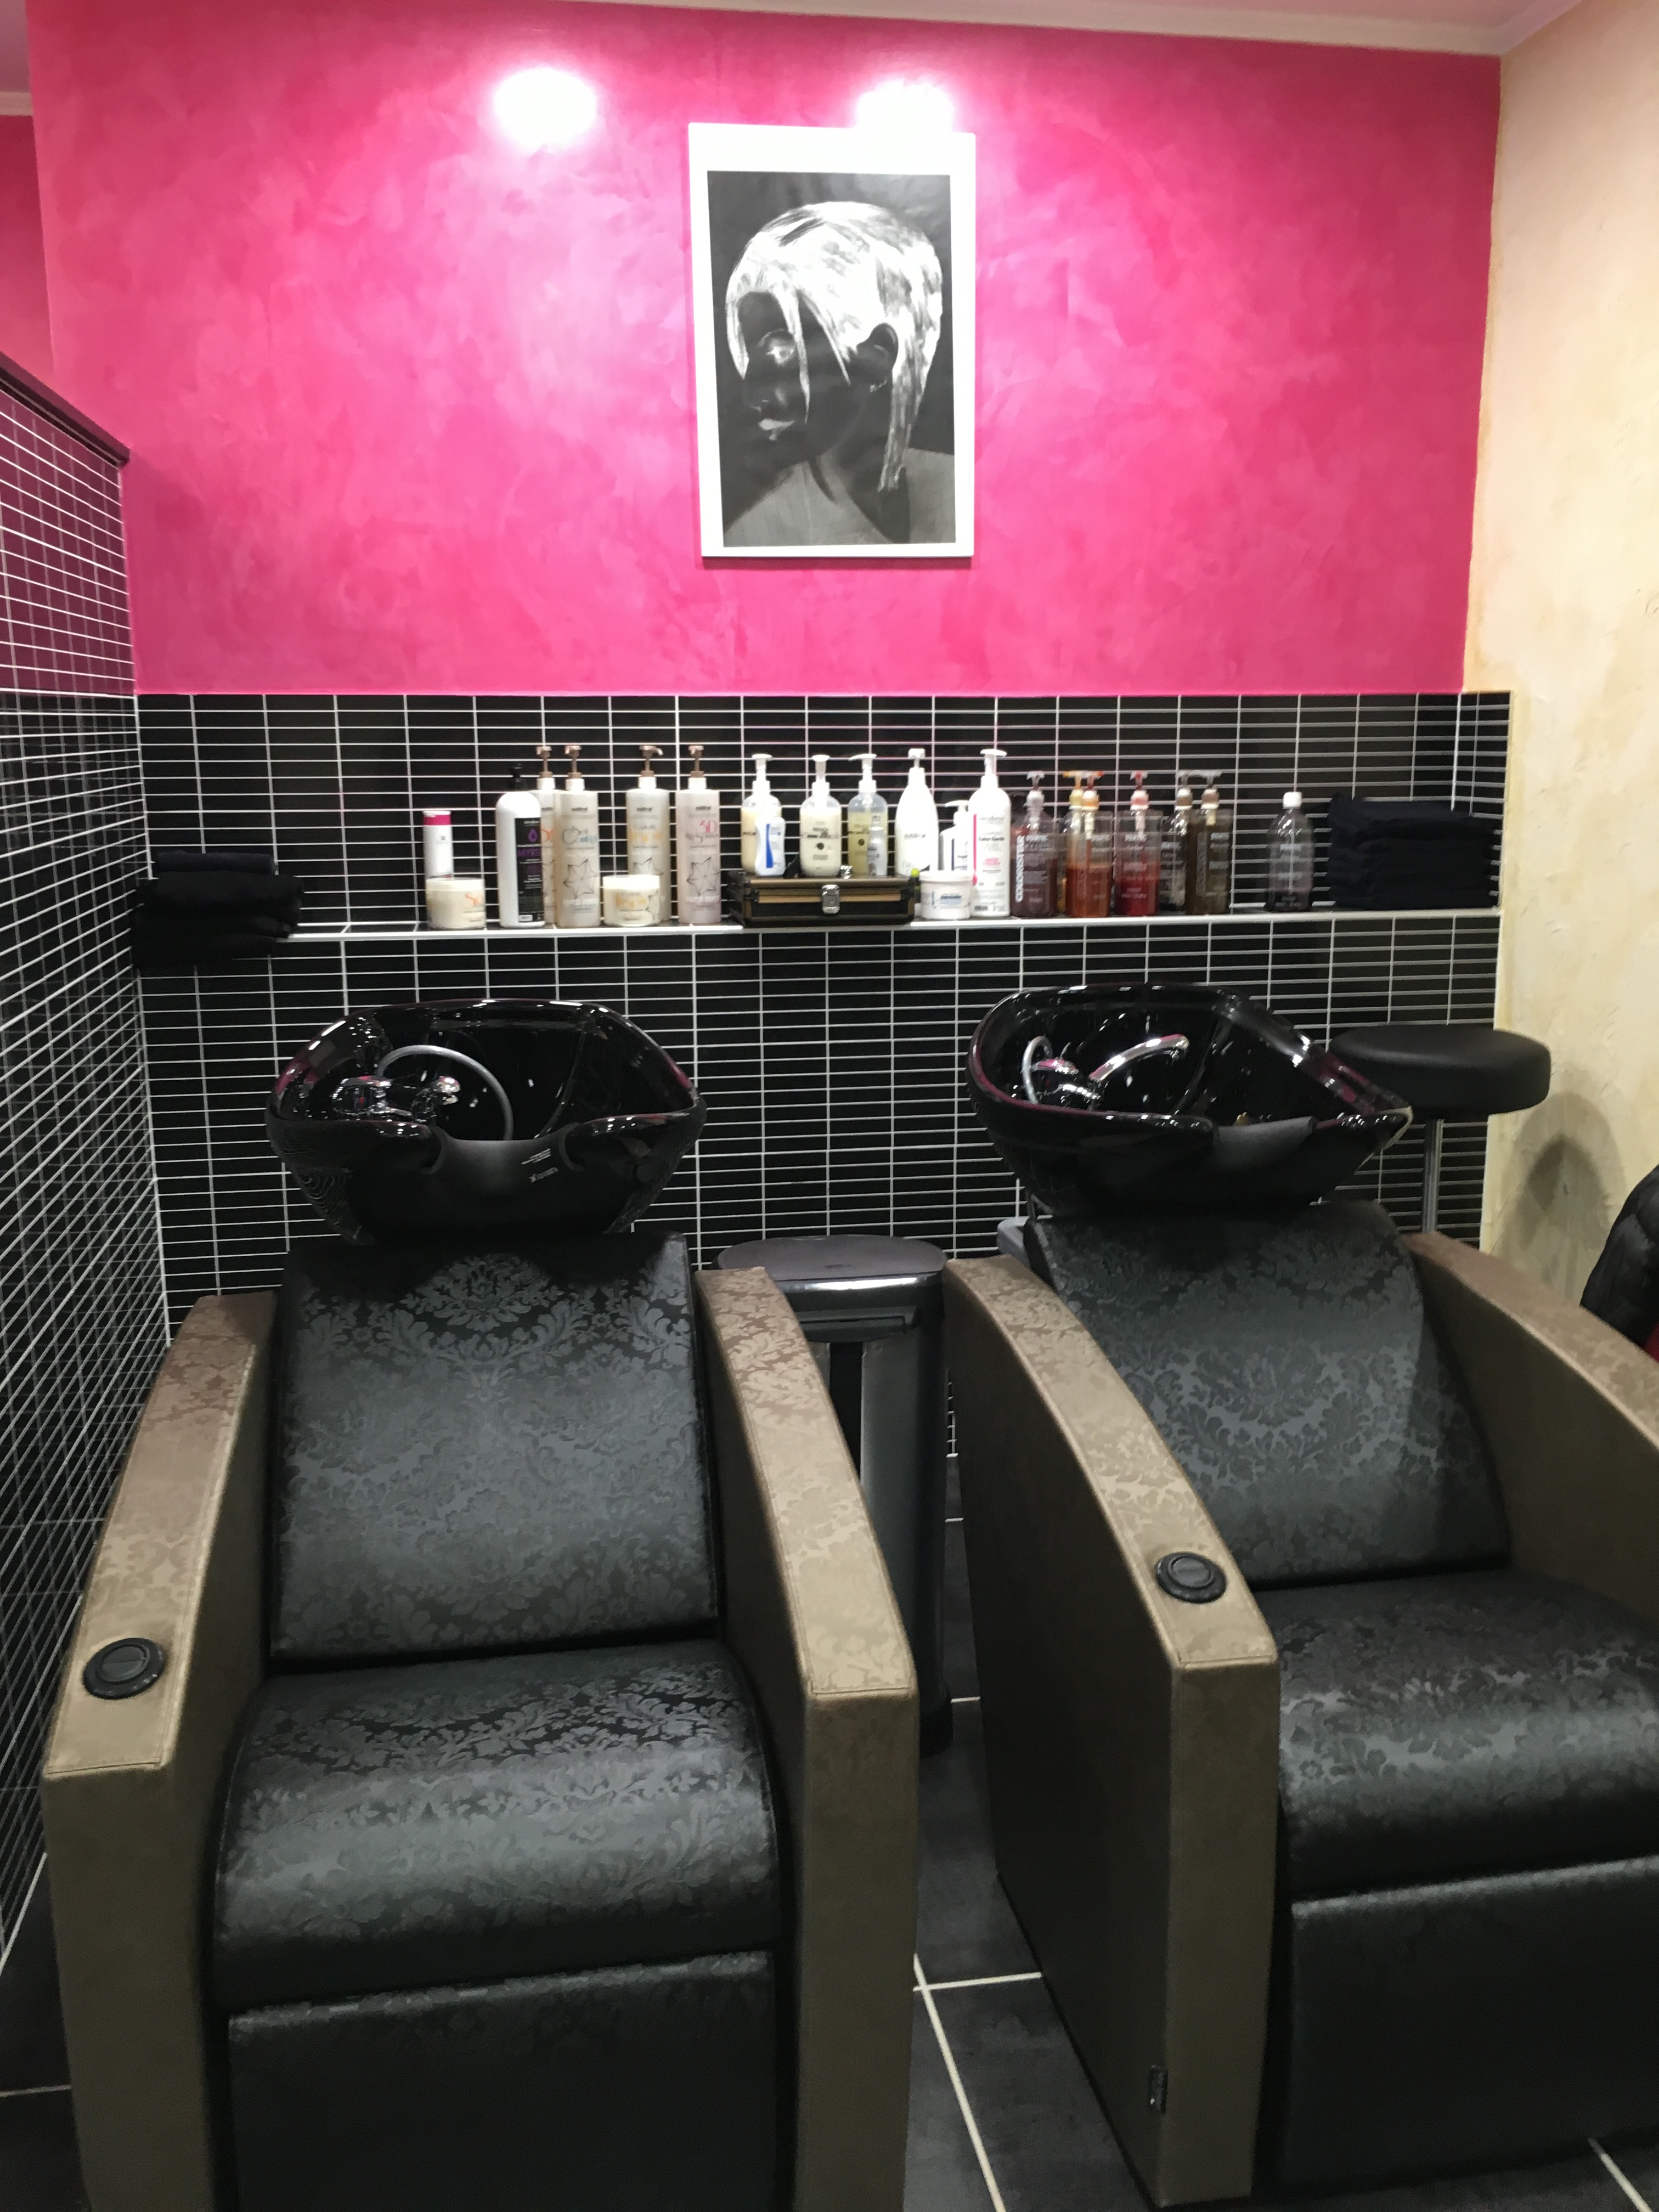 Ru00eavu00e9lation coiffure cru00e9ateur Barber shop Miramas - Avis Tarifs Horaires Tu00e9lu00e9phone